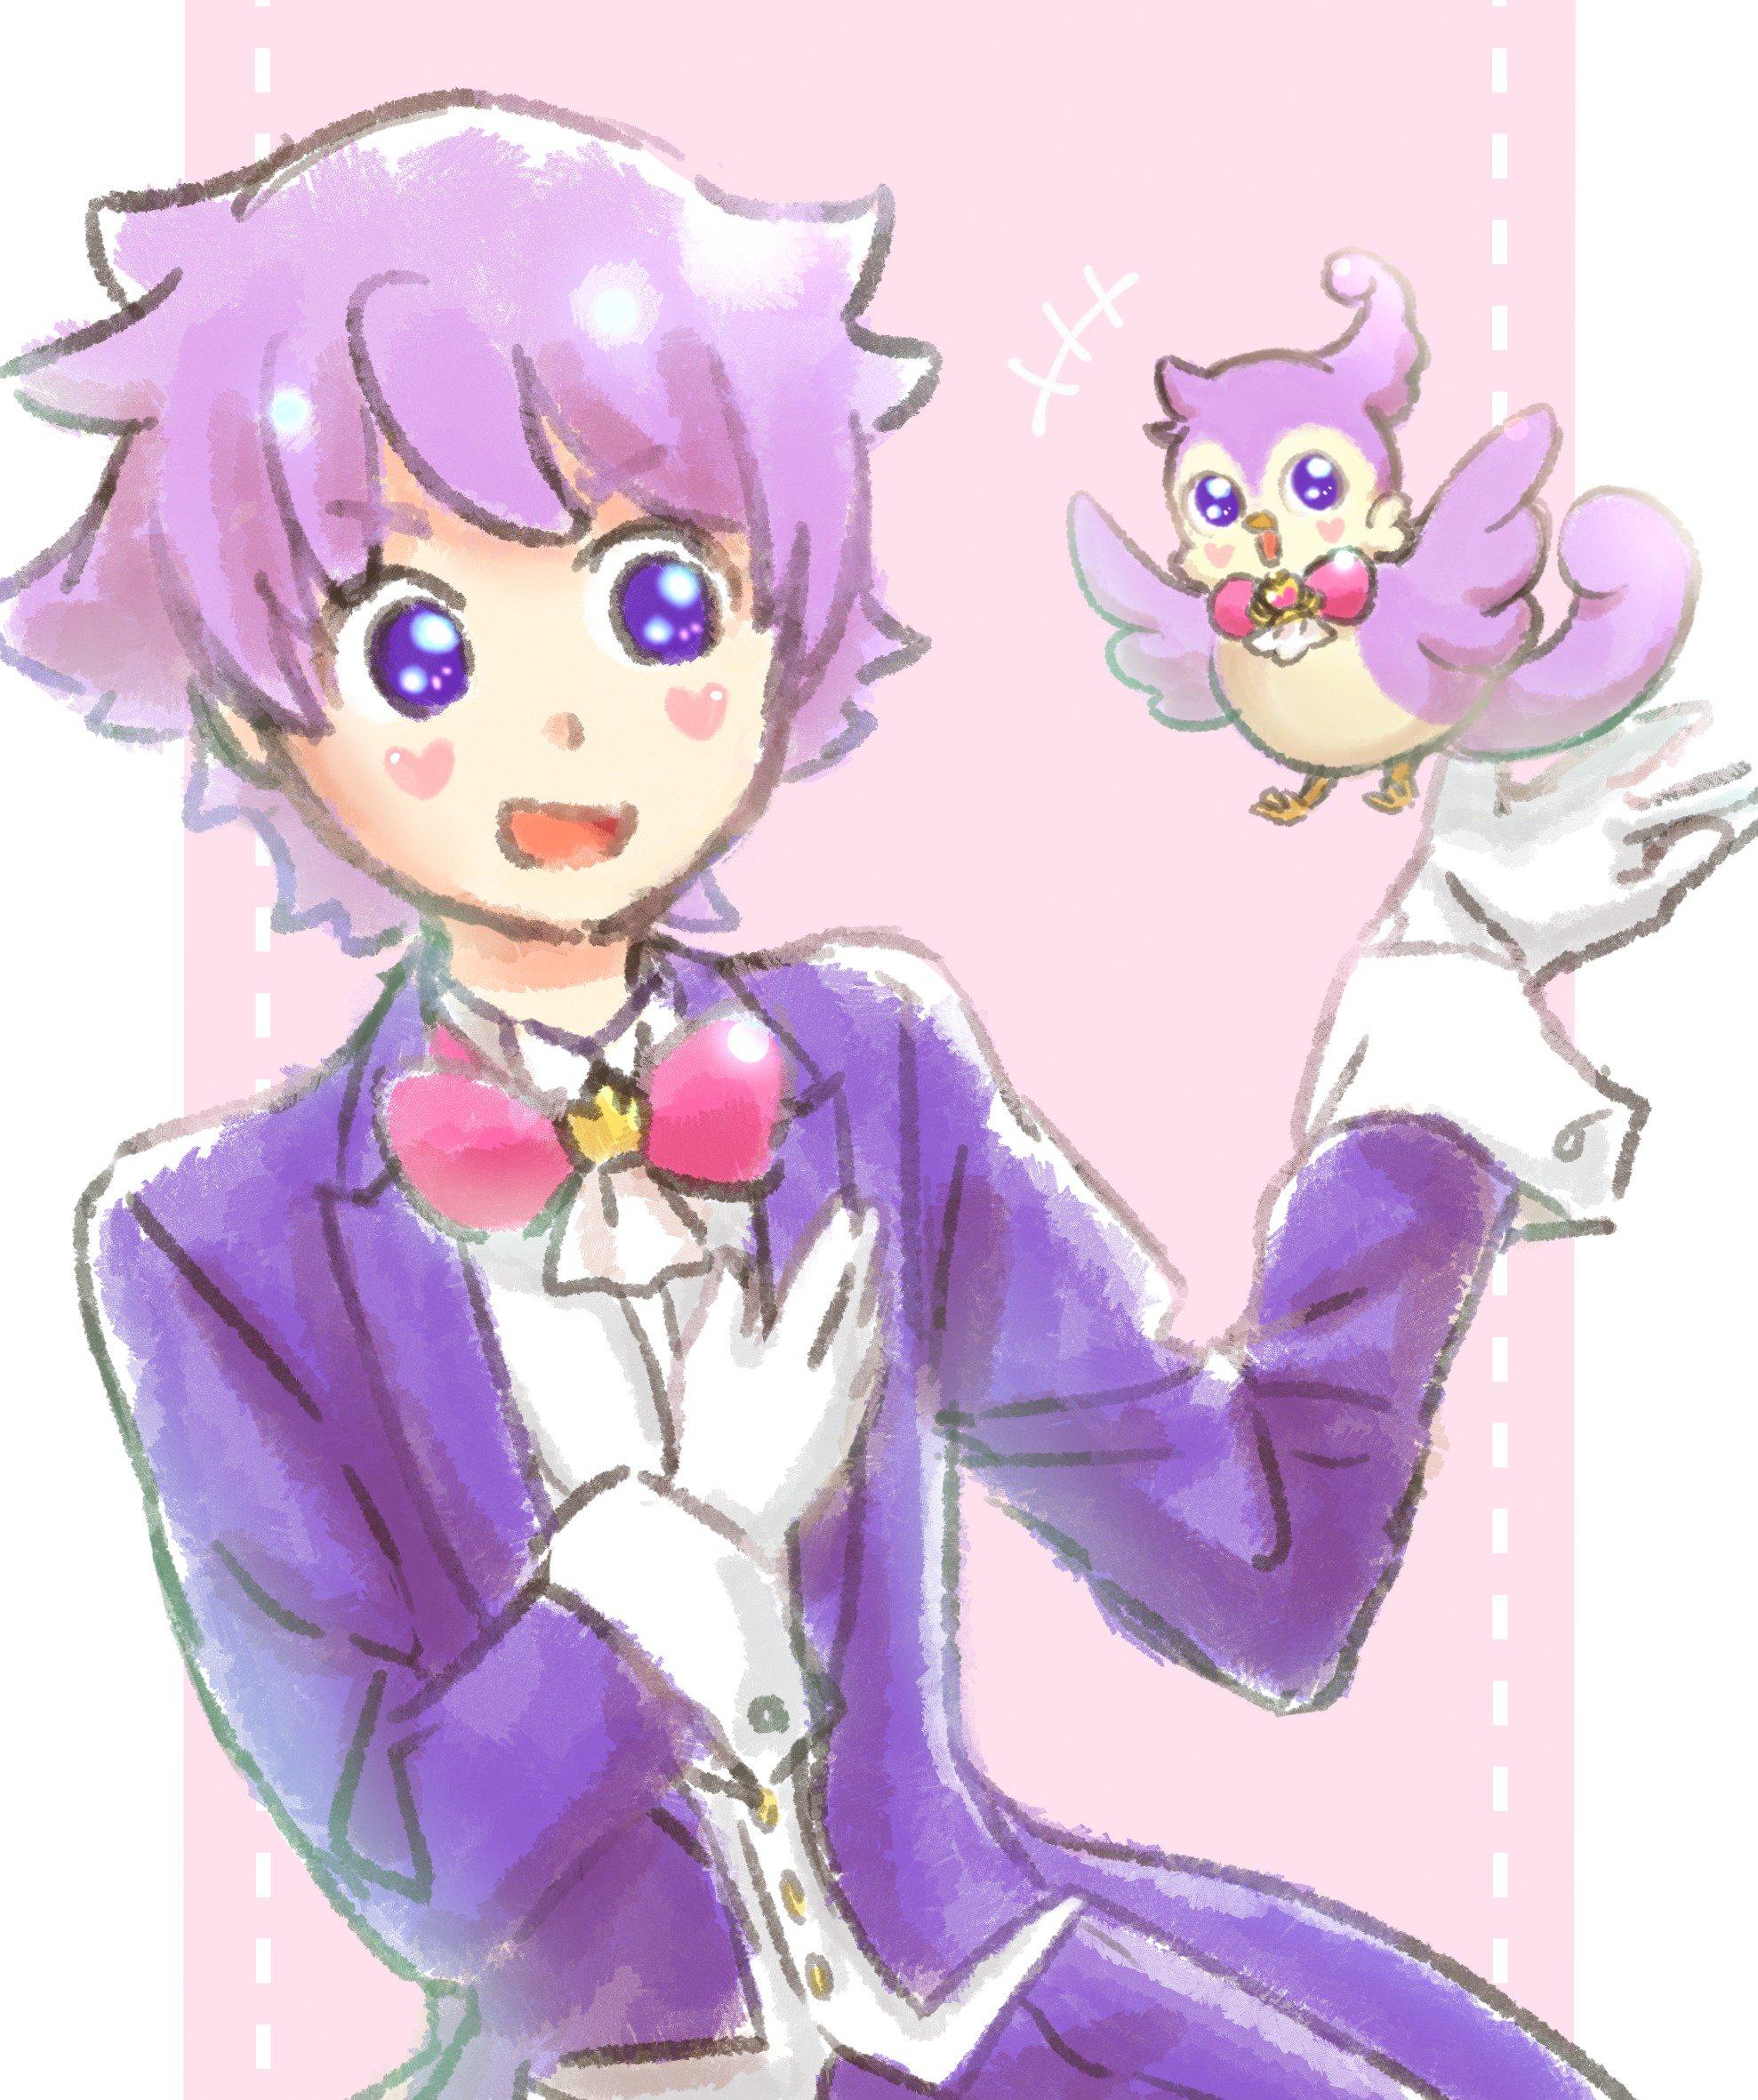 misago (@misago33695466)さんのイラスト